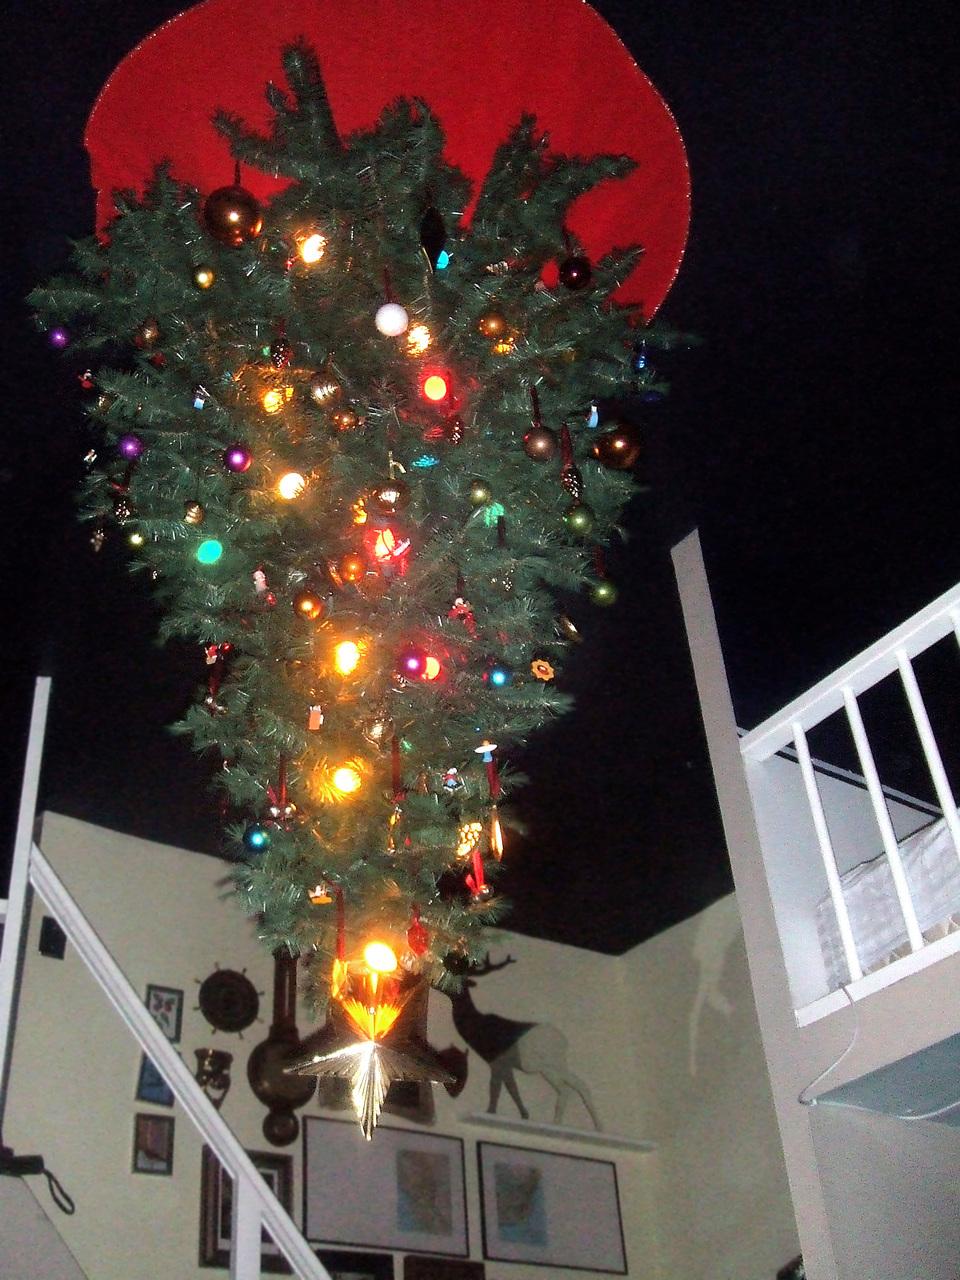 My upside down Christmas tree.